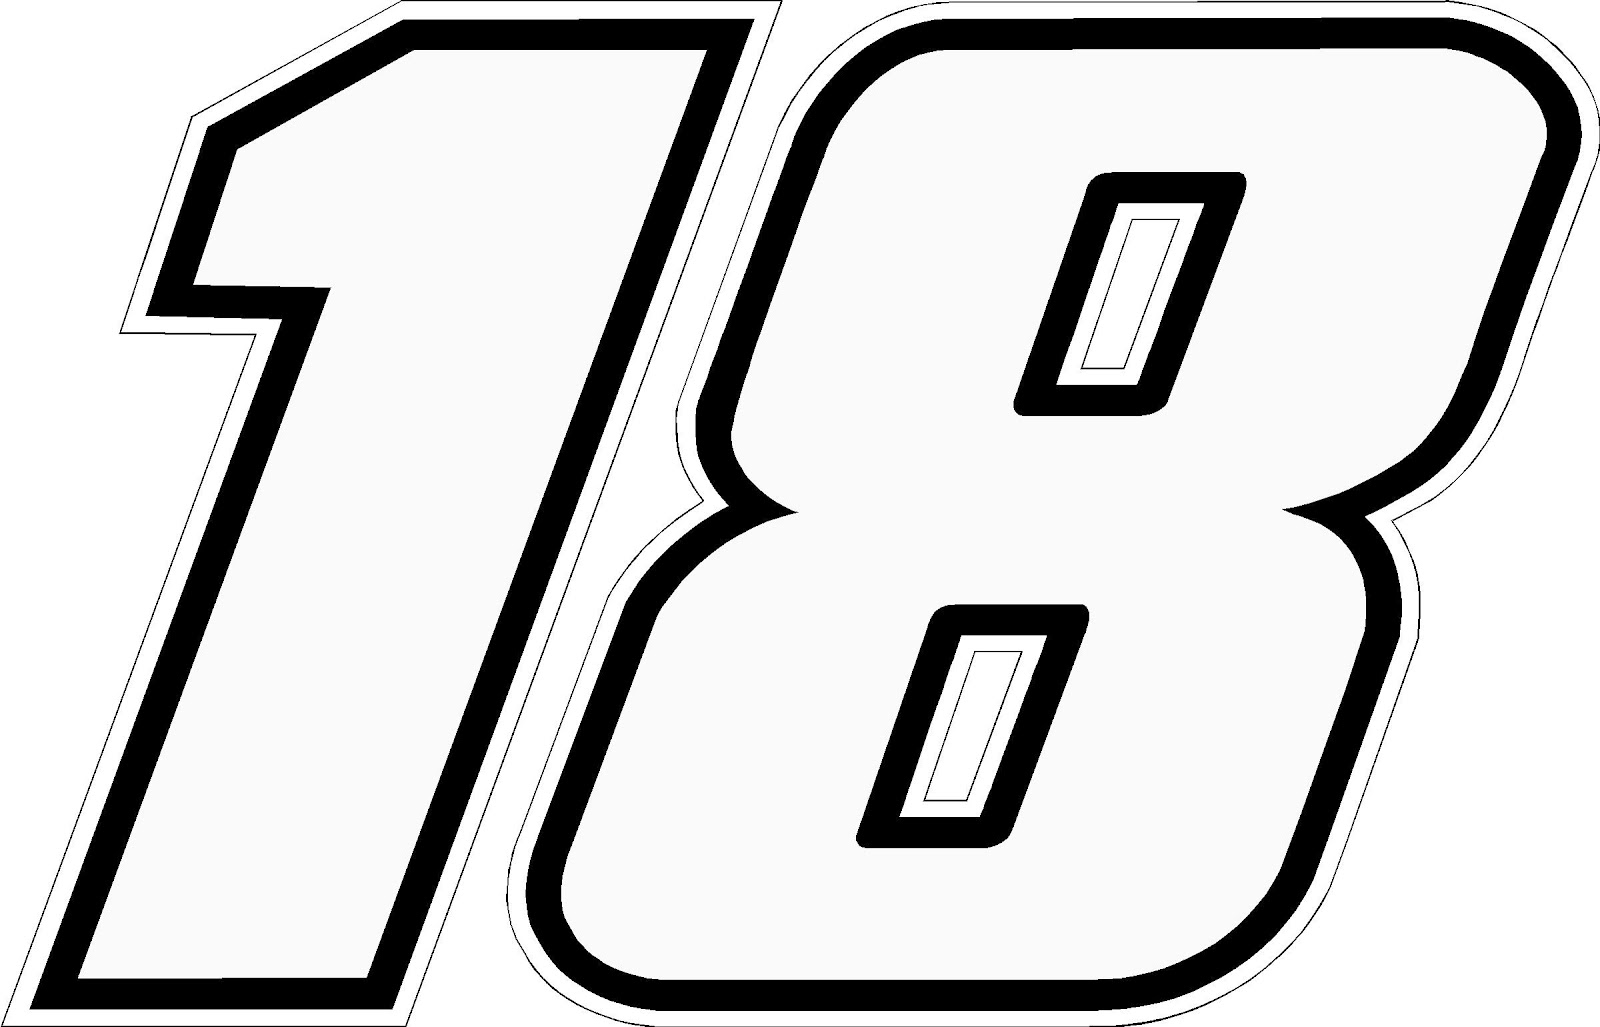 Gibbs Garage Late Race Fuel Error Costly For Denny Hamlin